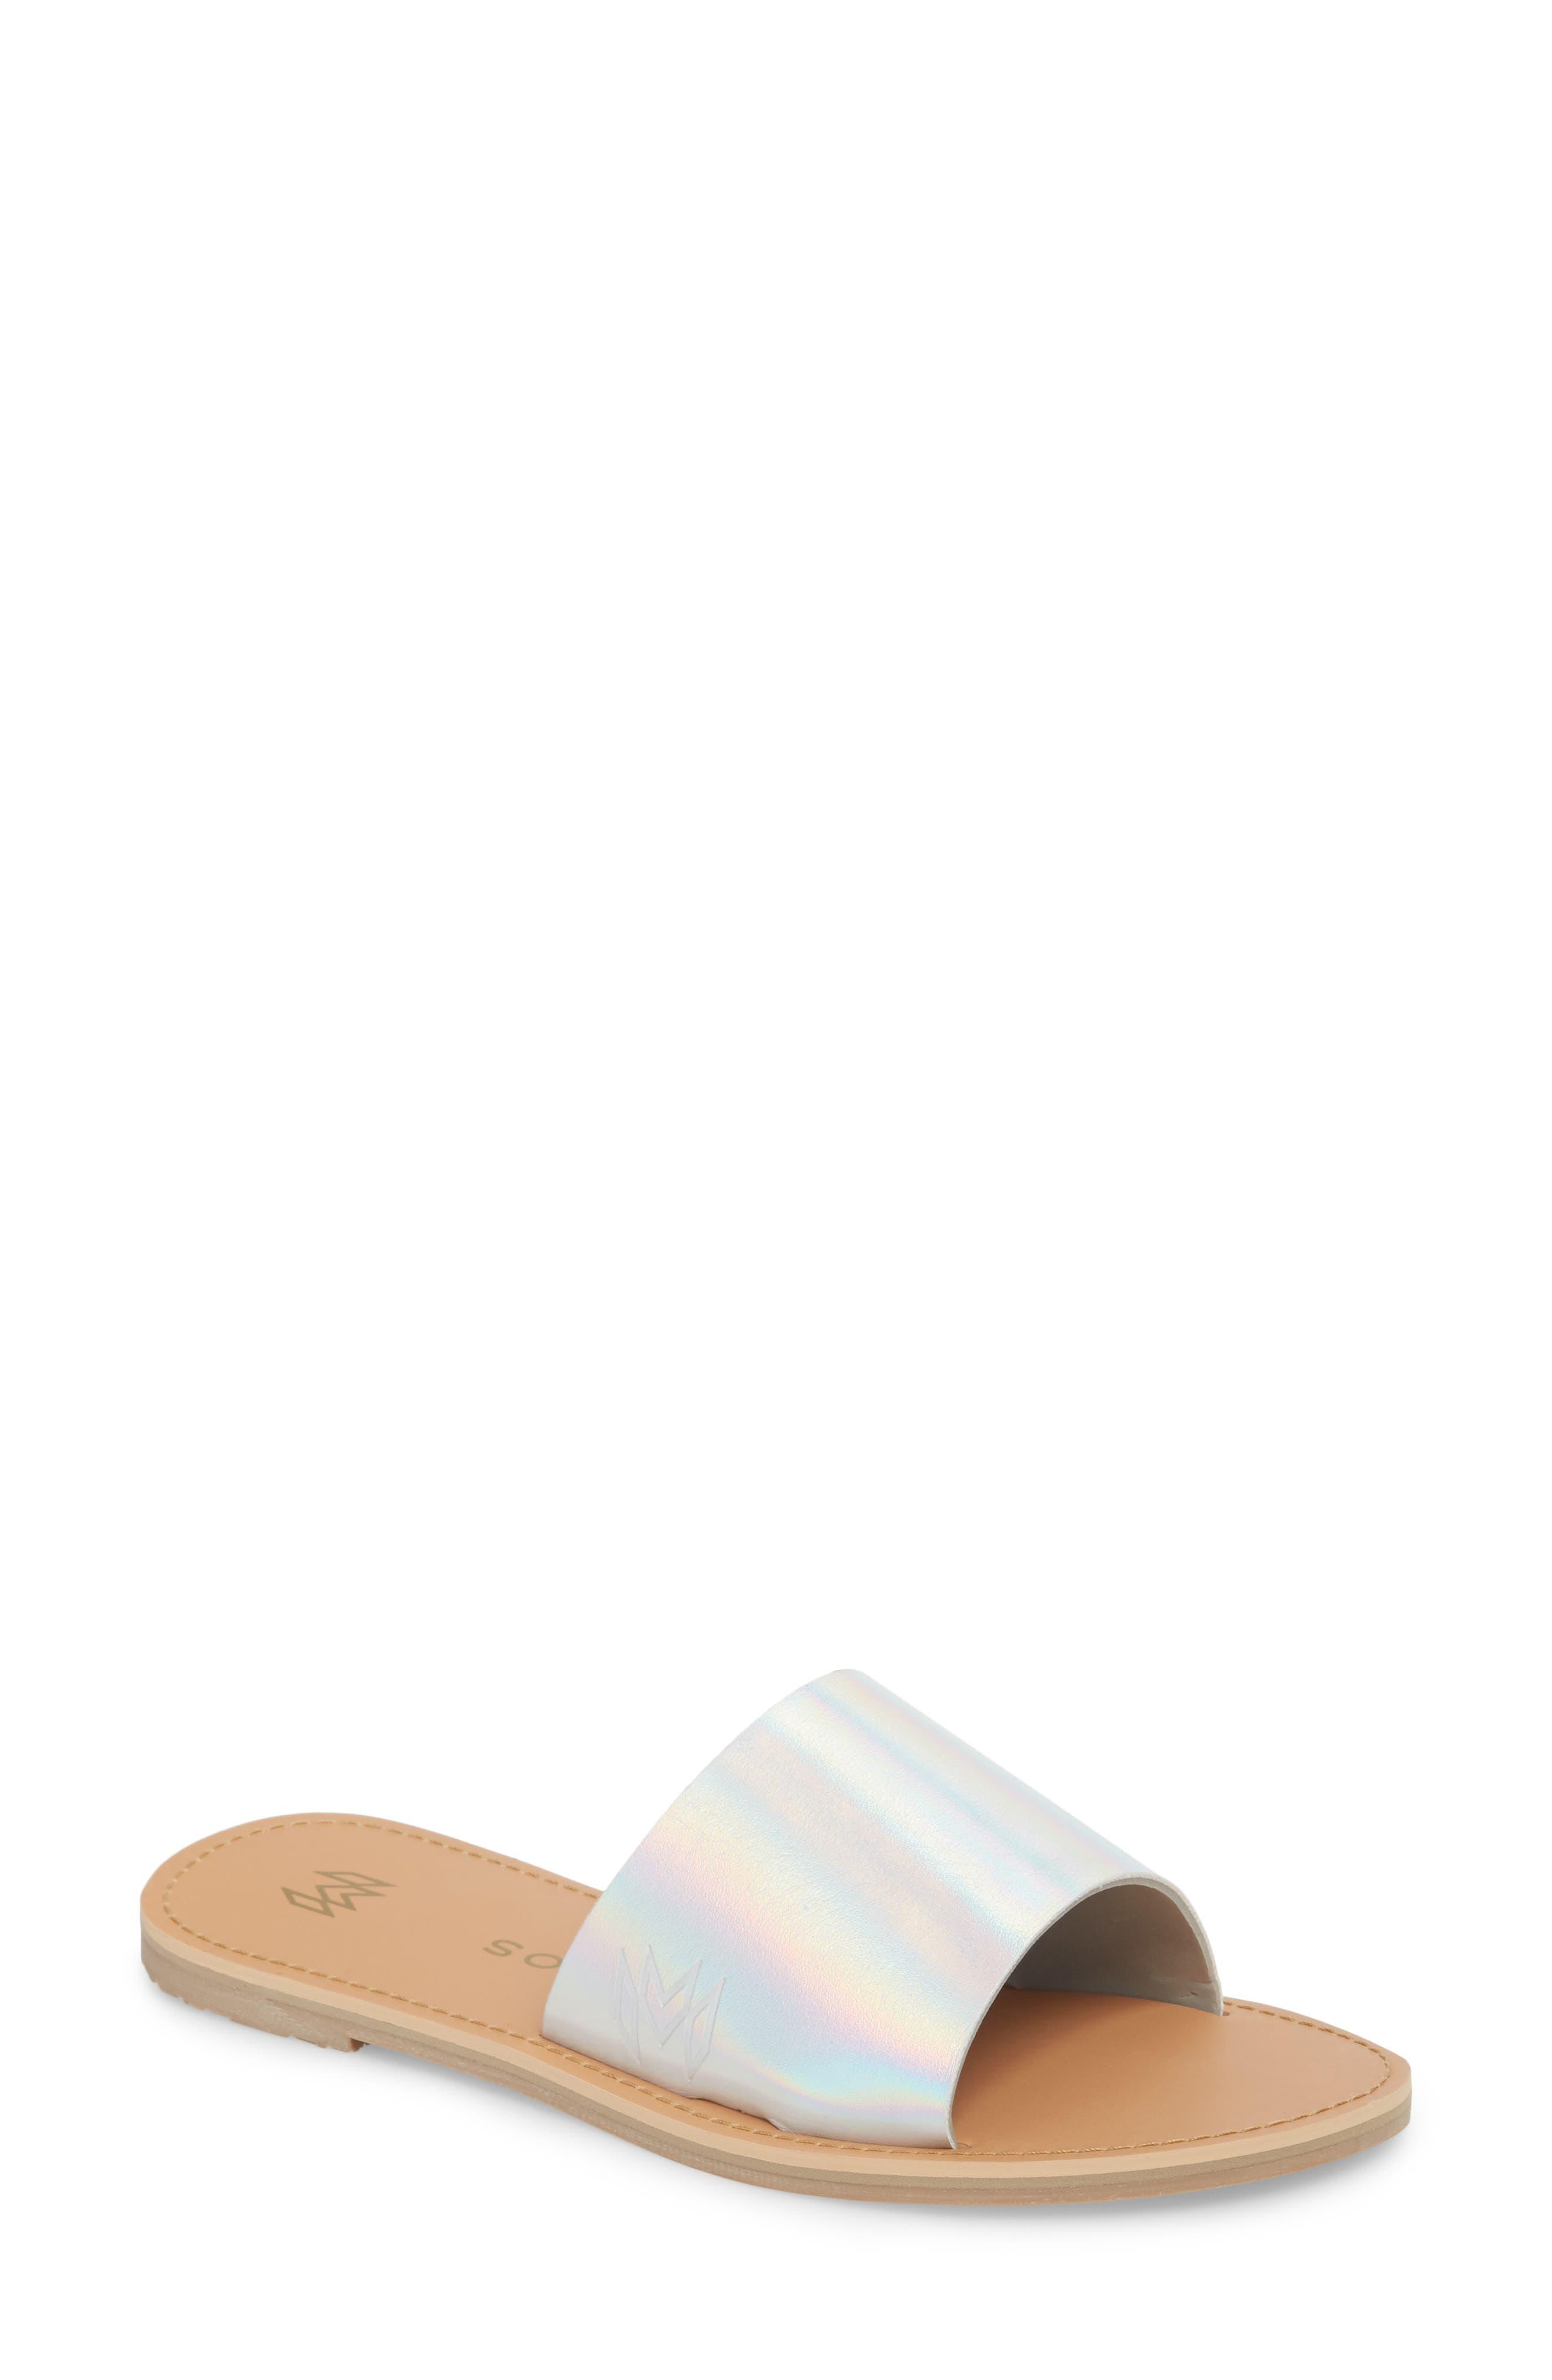 Icon Taylor Slide Sandal,                             Main thumbnail 1, color,                             PLATINUM